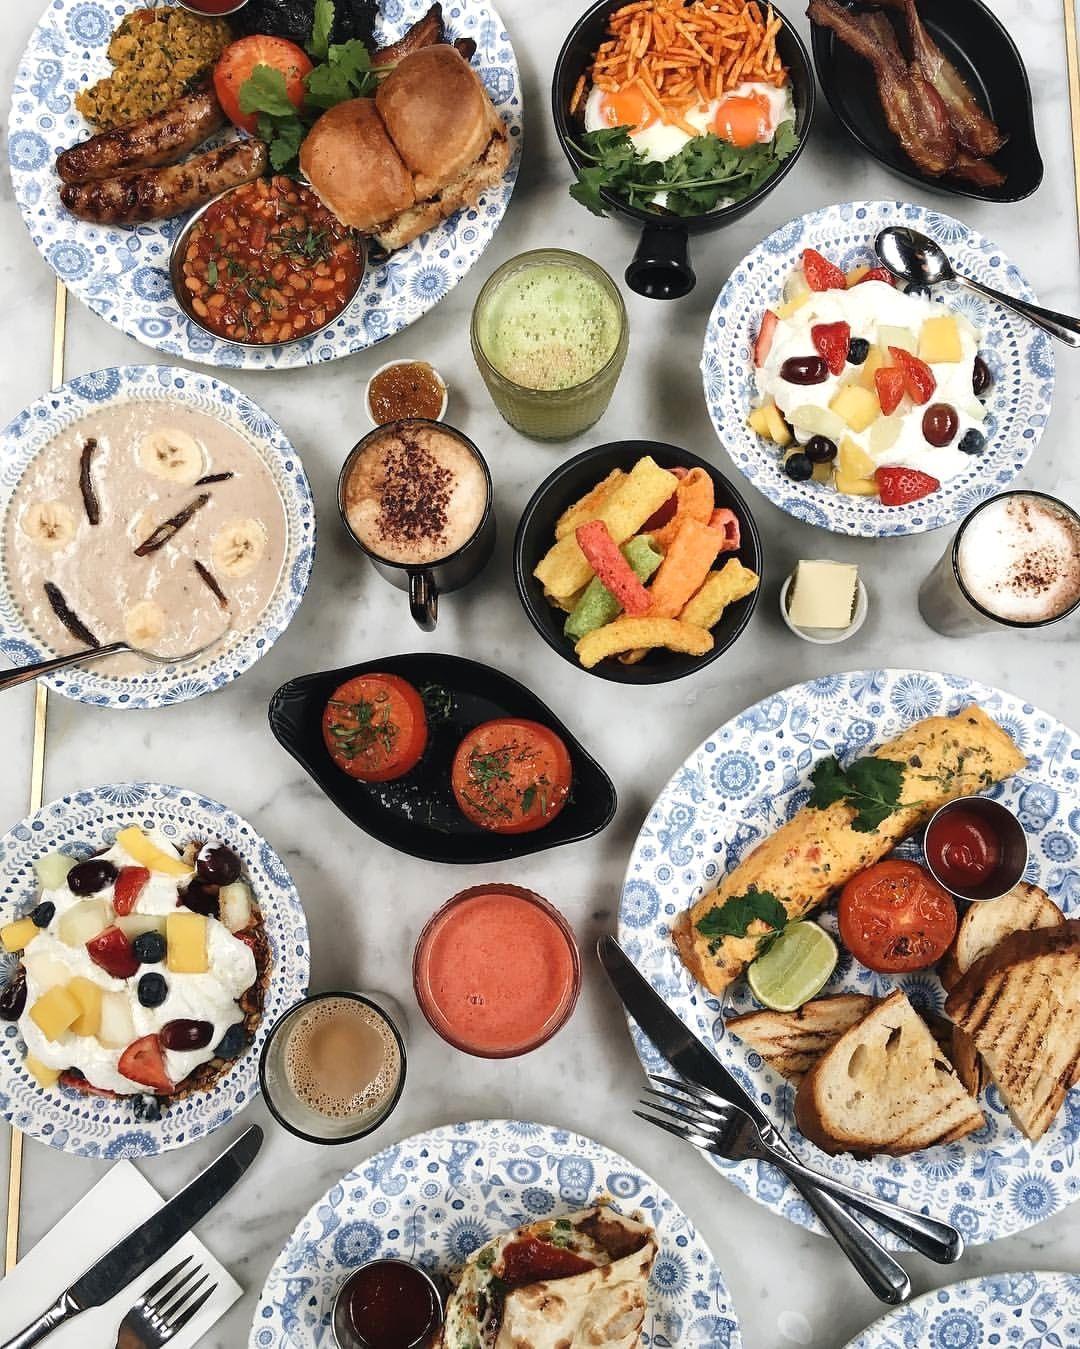 All I Want For Breakfast Flashback To This Feast With Taramilktea Food Homemade Recipes Health Breakfast